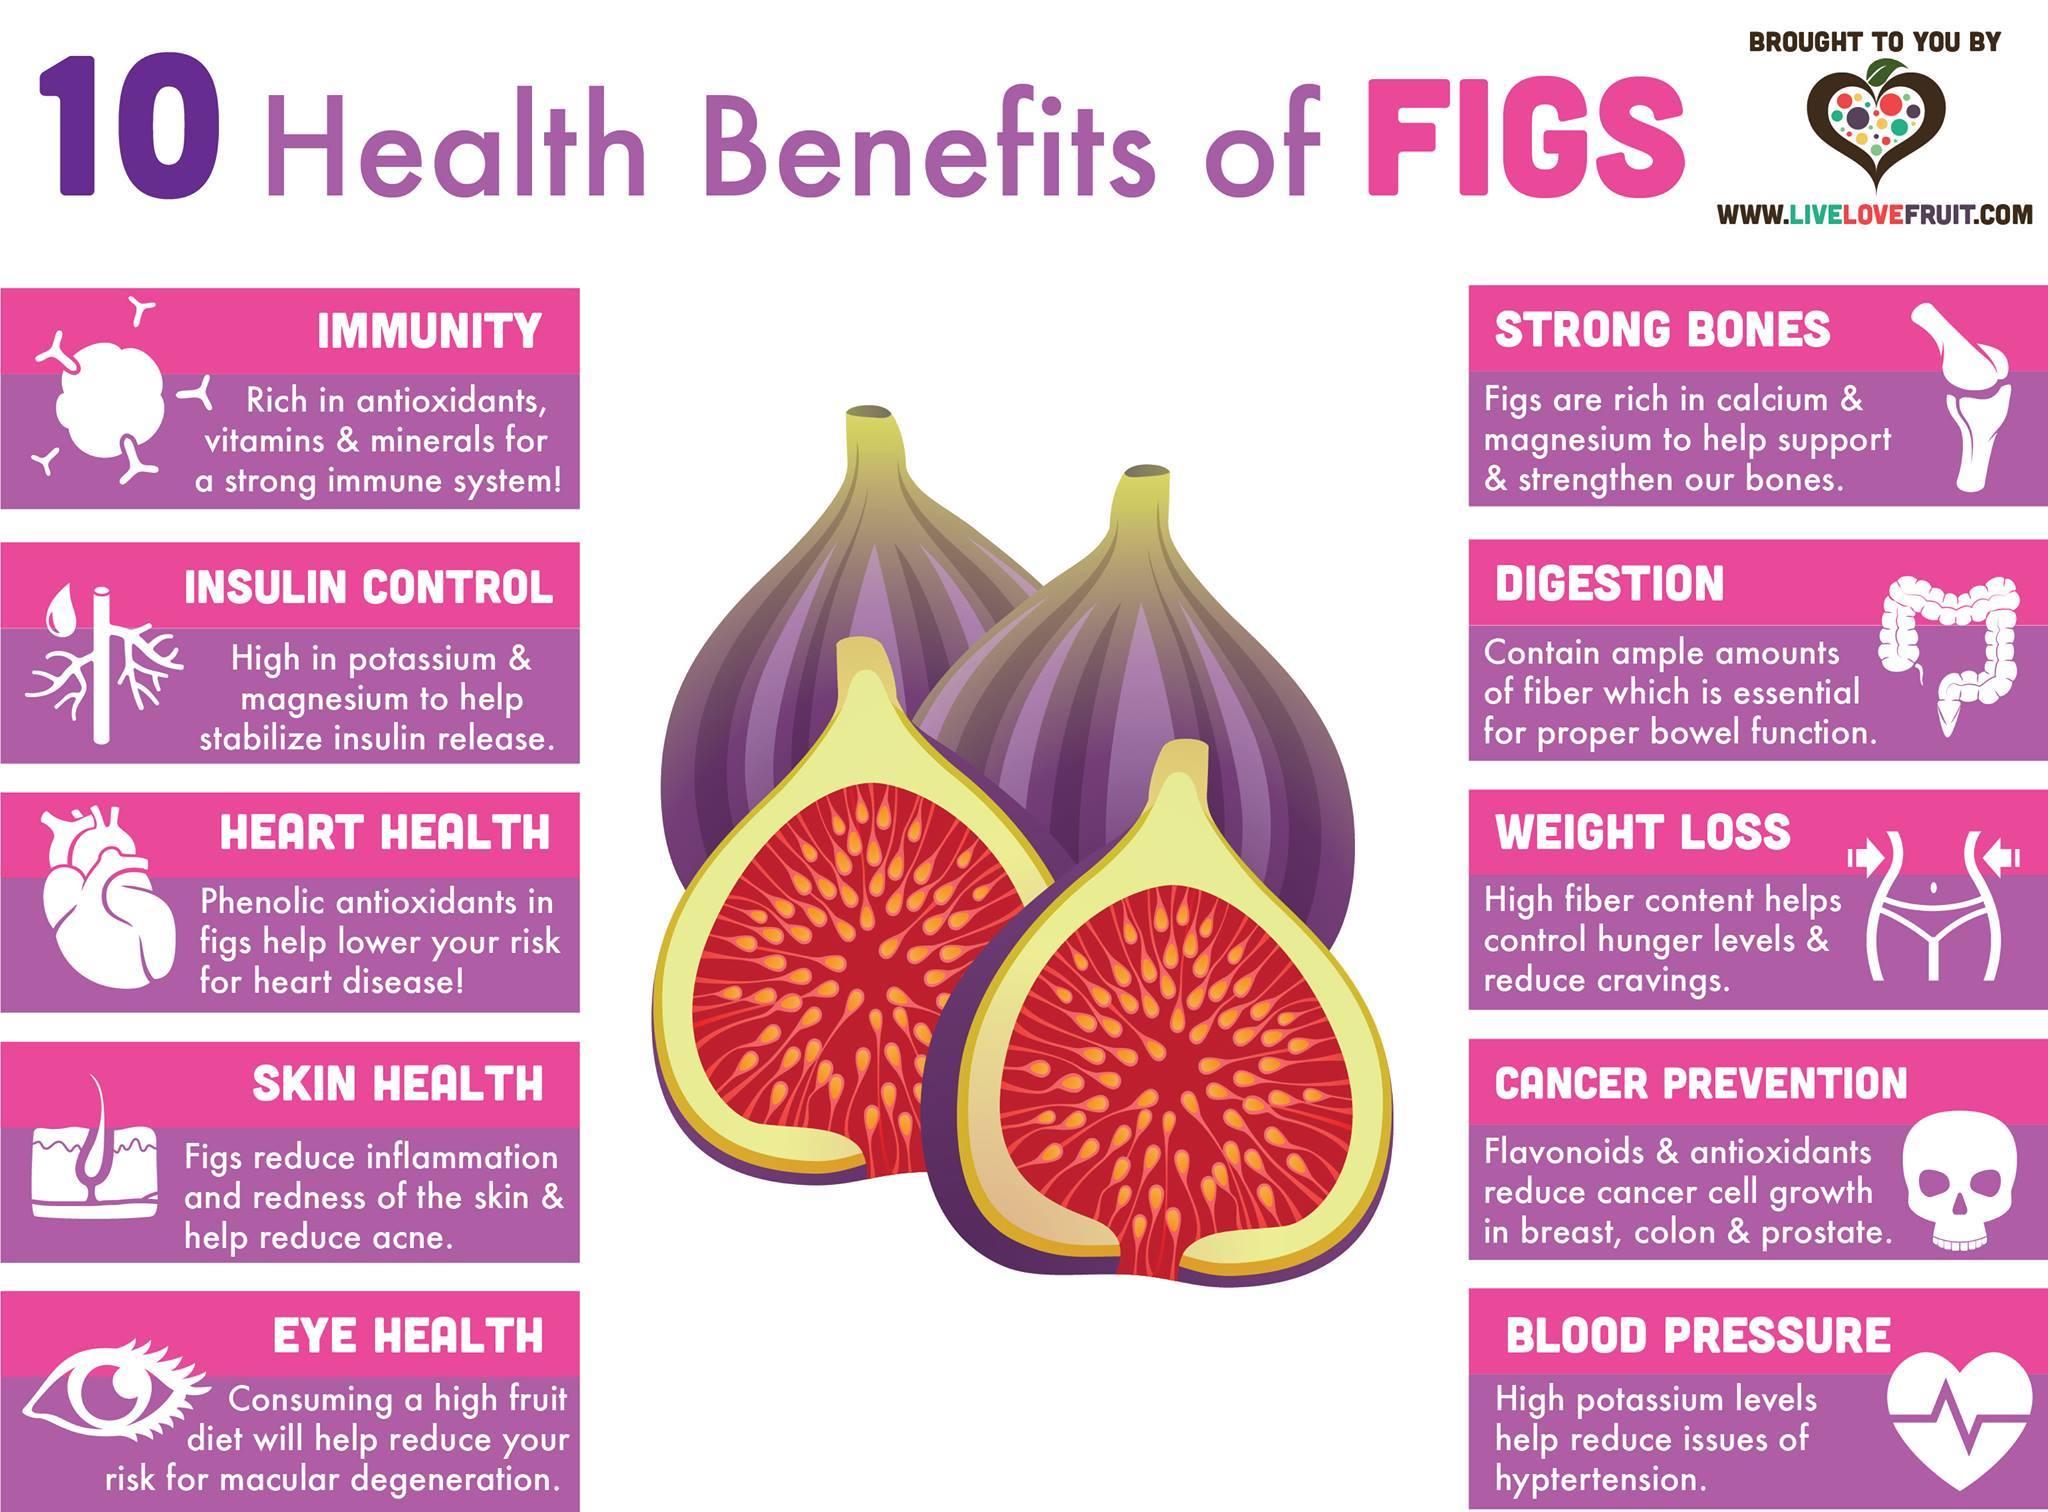 figsinfo